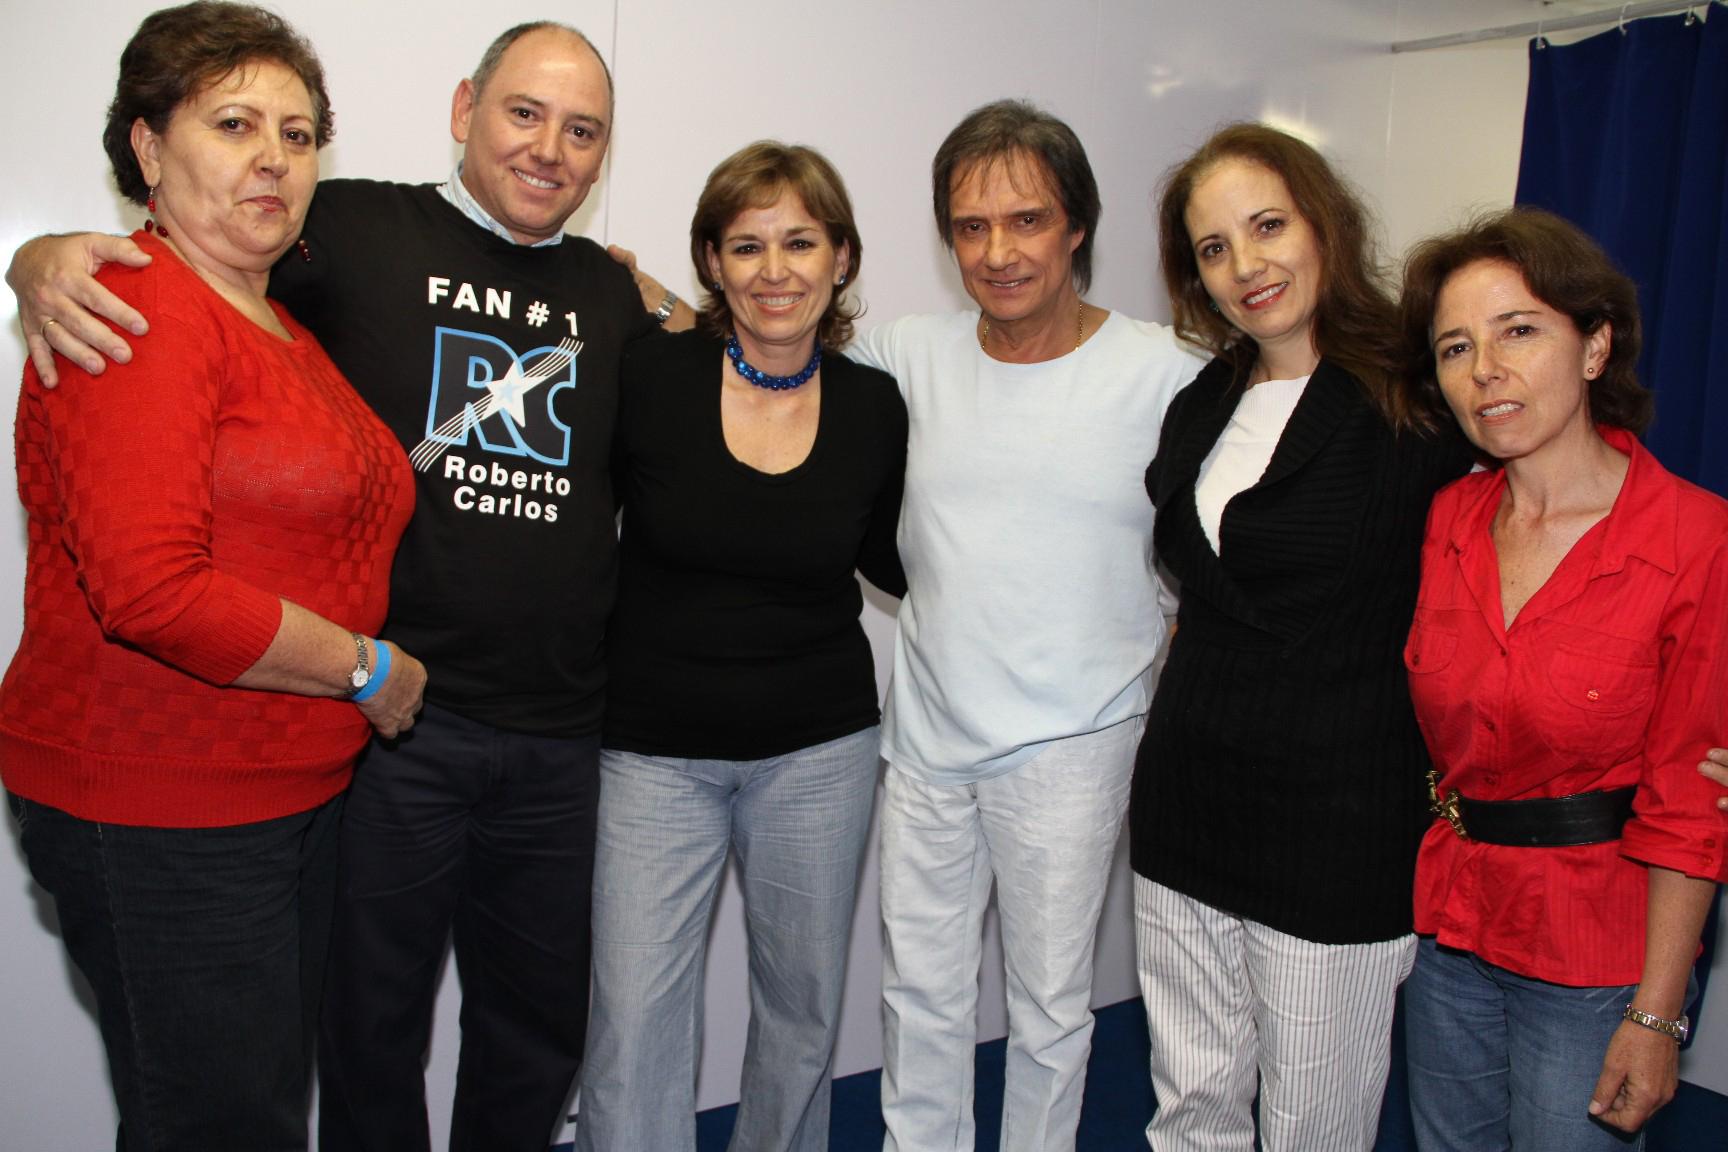 Raul Ospina